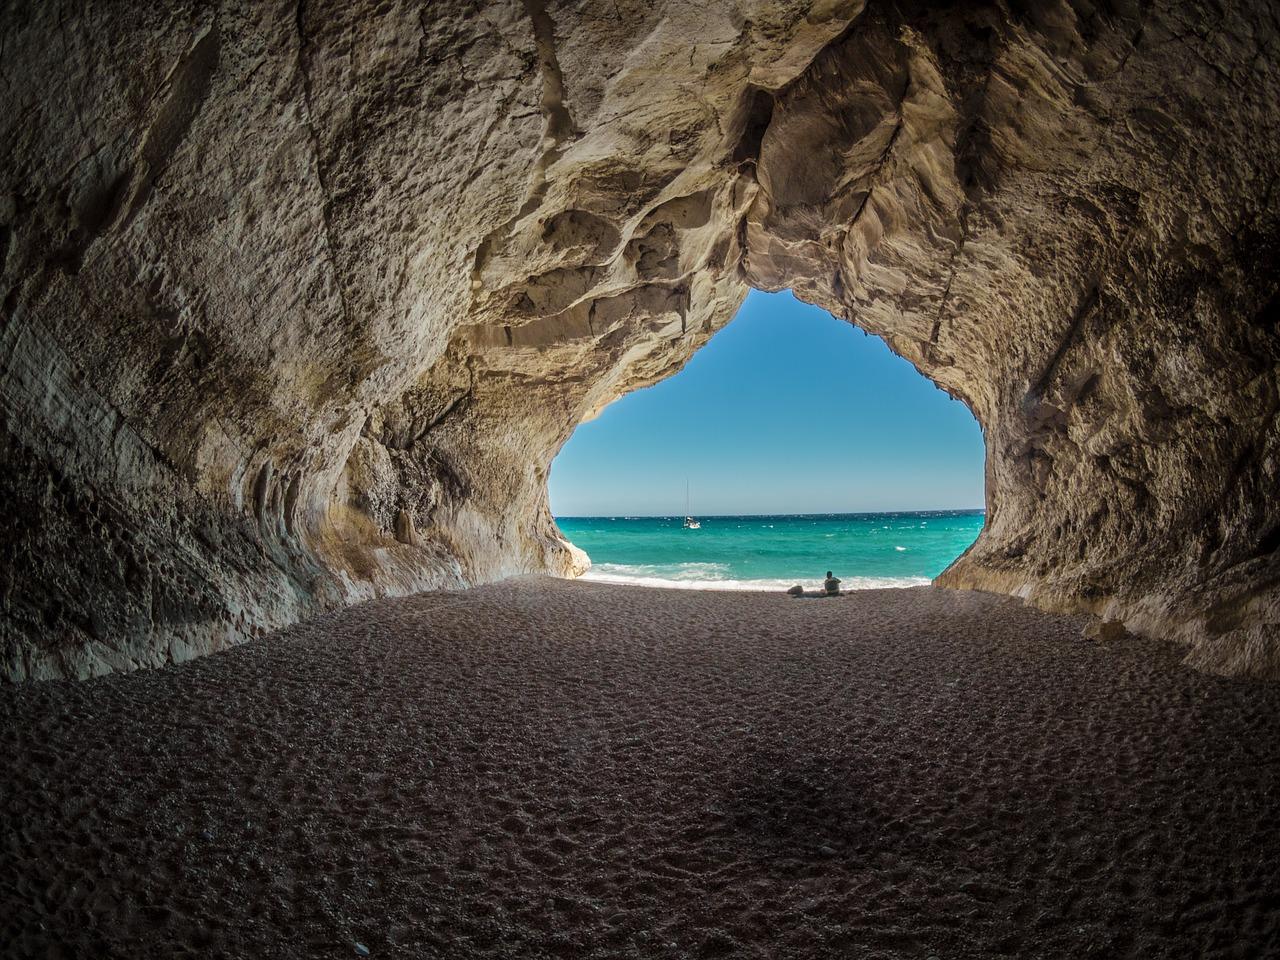 Beautiful Cove In Sardinia (img from Pixabay)